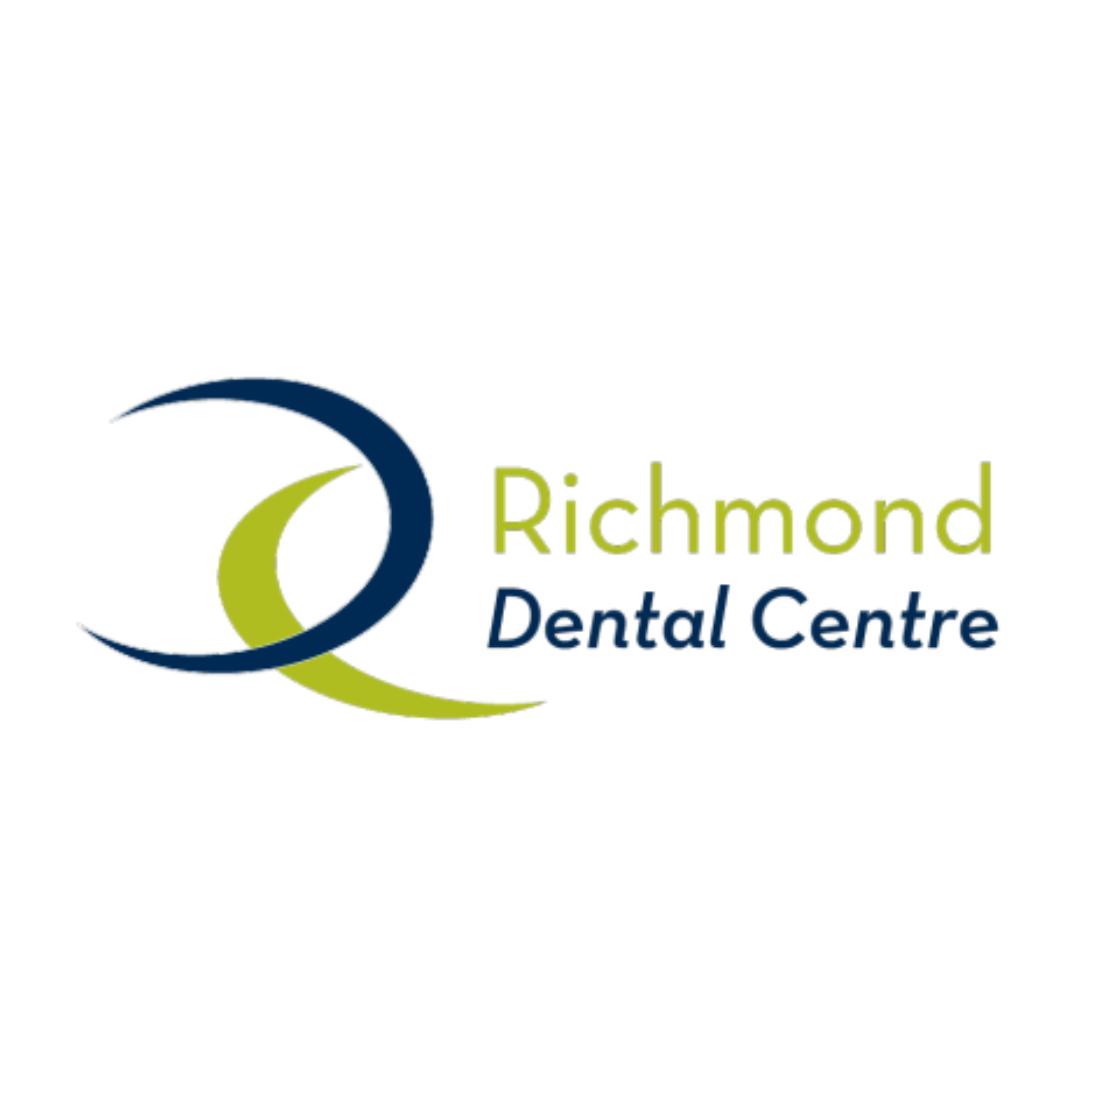 richmond dental centre.png